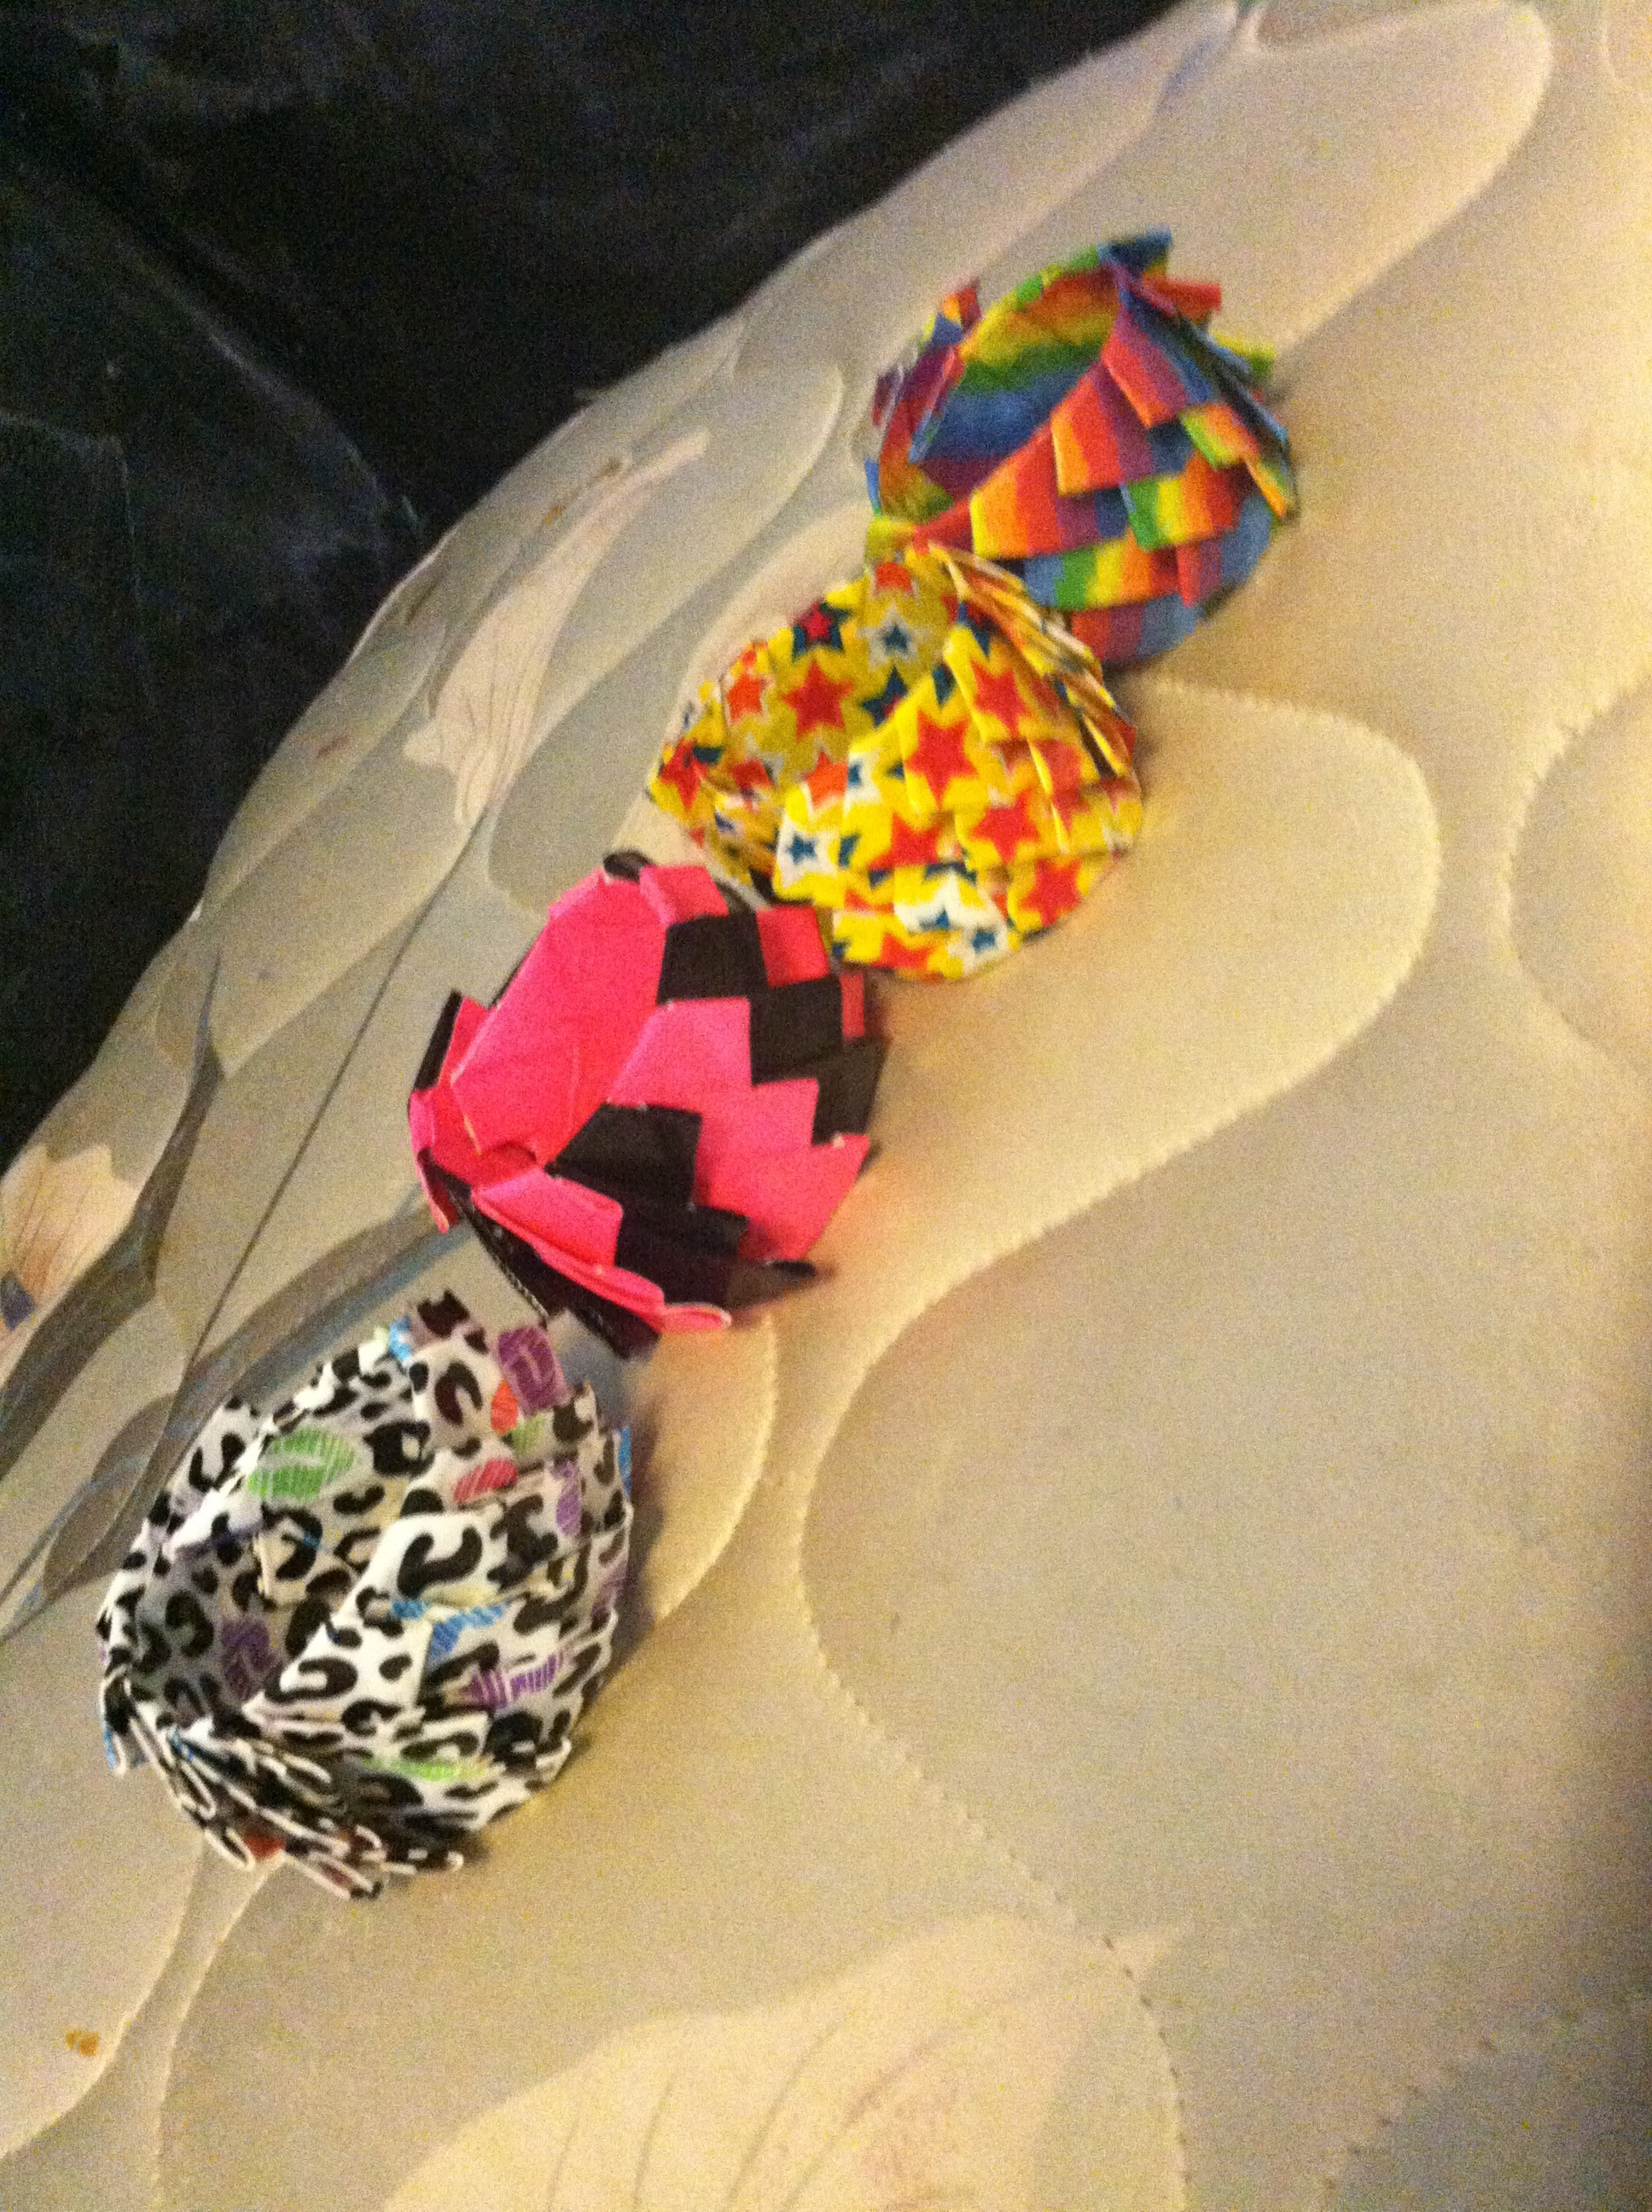 How to make a duct tape petal bracelet